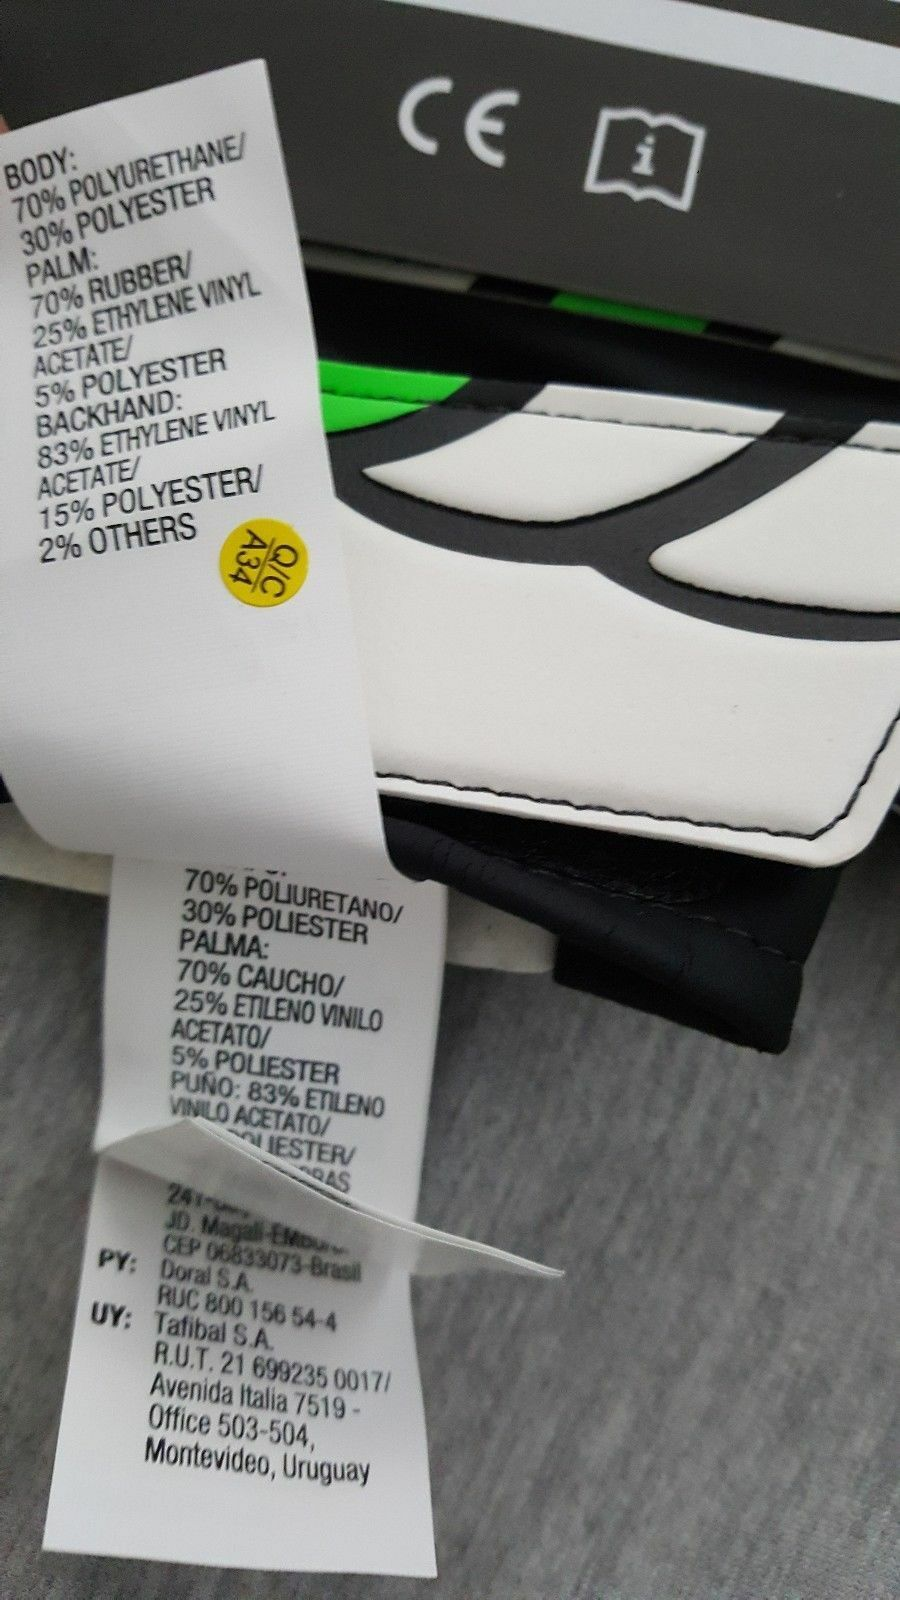 adidas outlet avenida italia